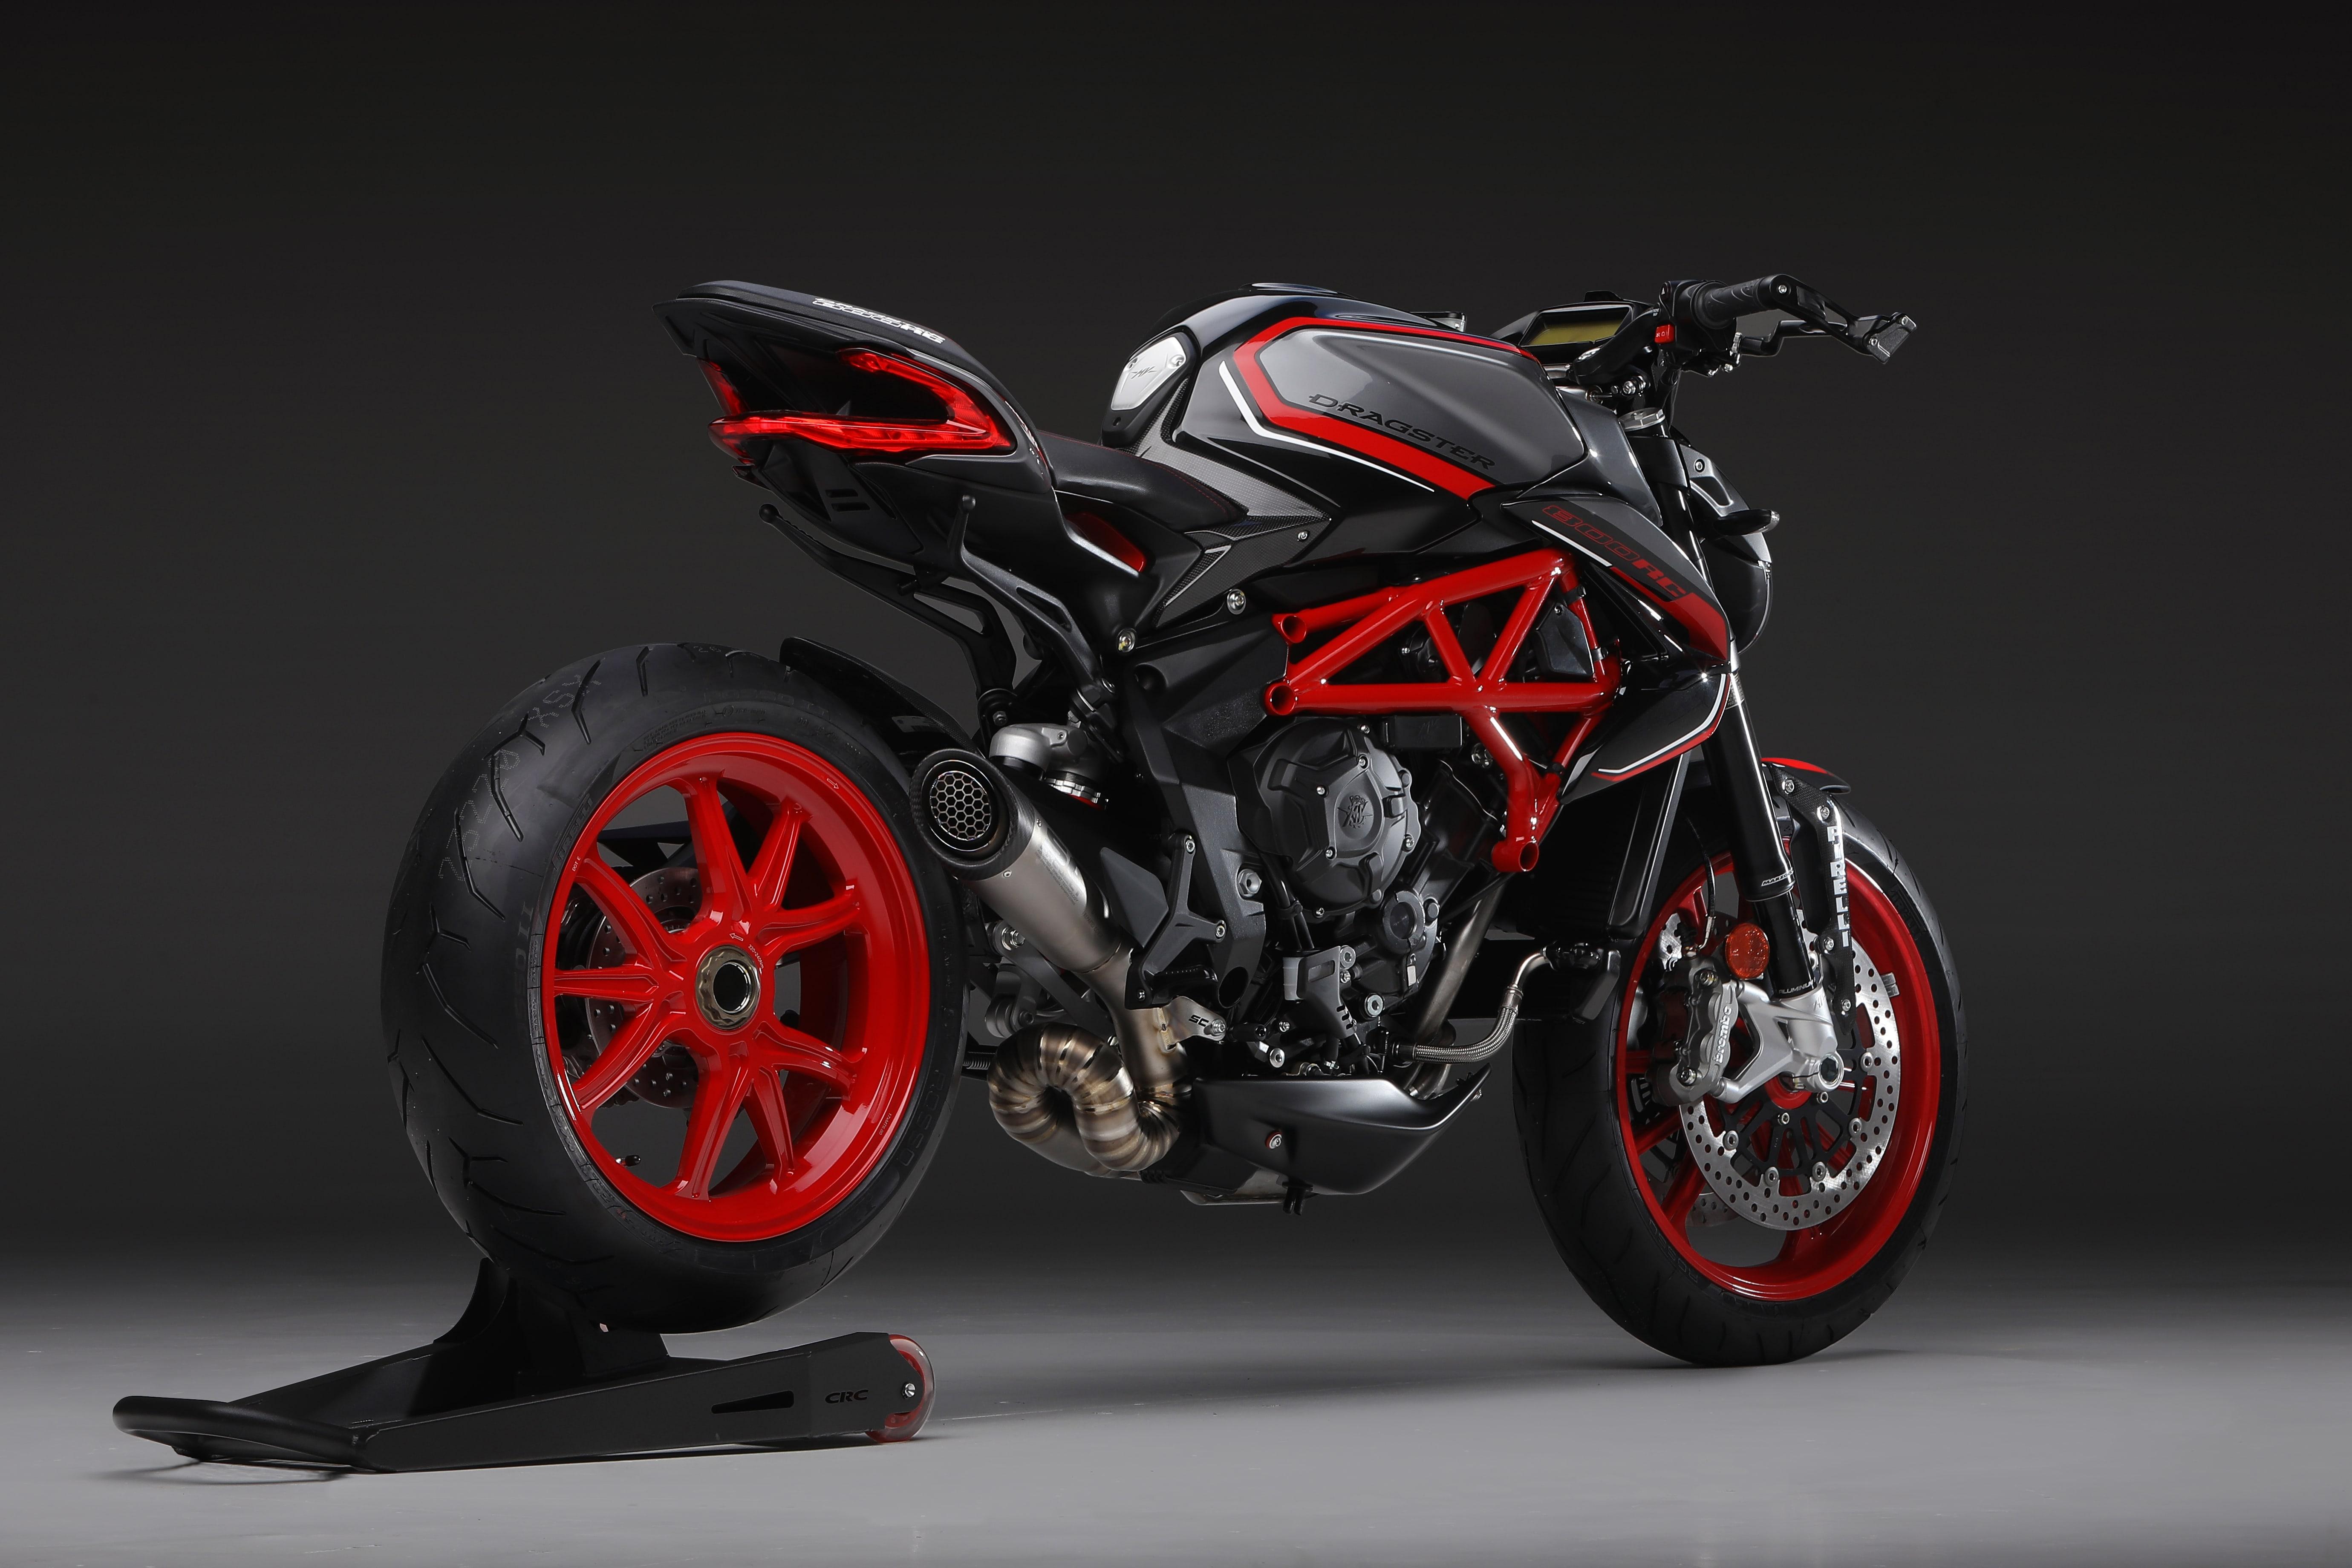 / METALLIC AVIO GREY / METALLIC CARBON BLACK / AGO RED